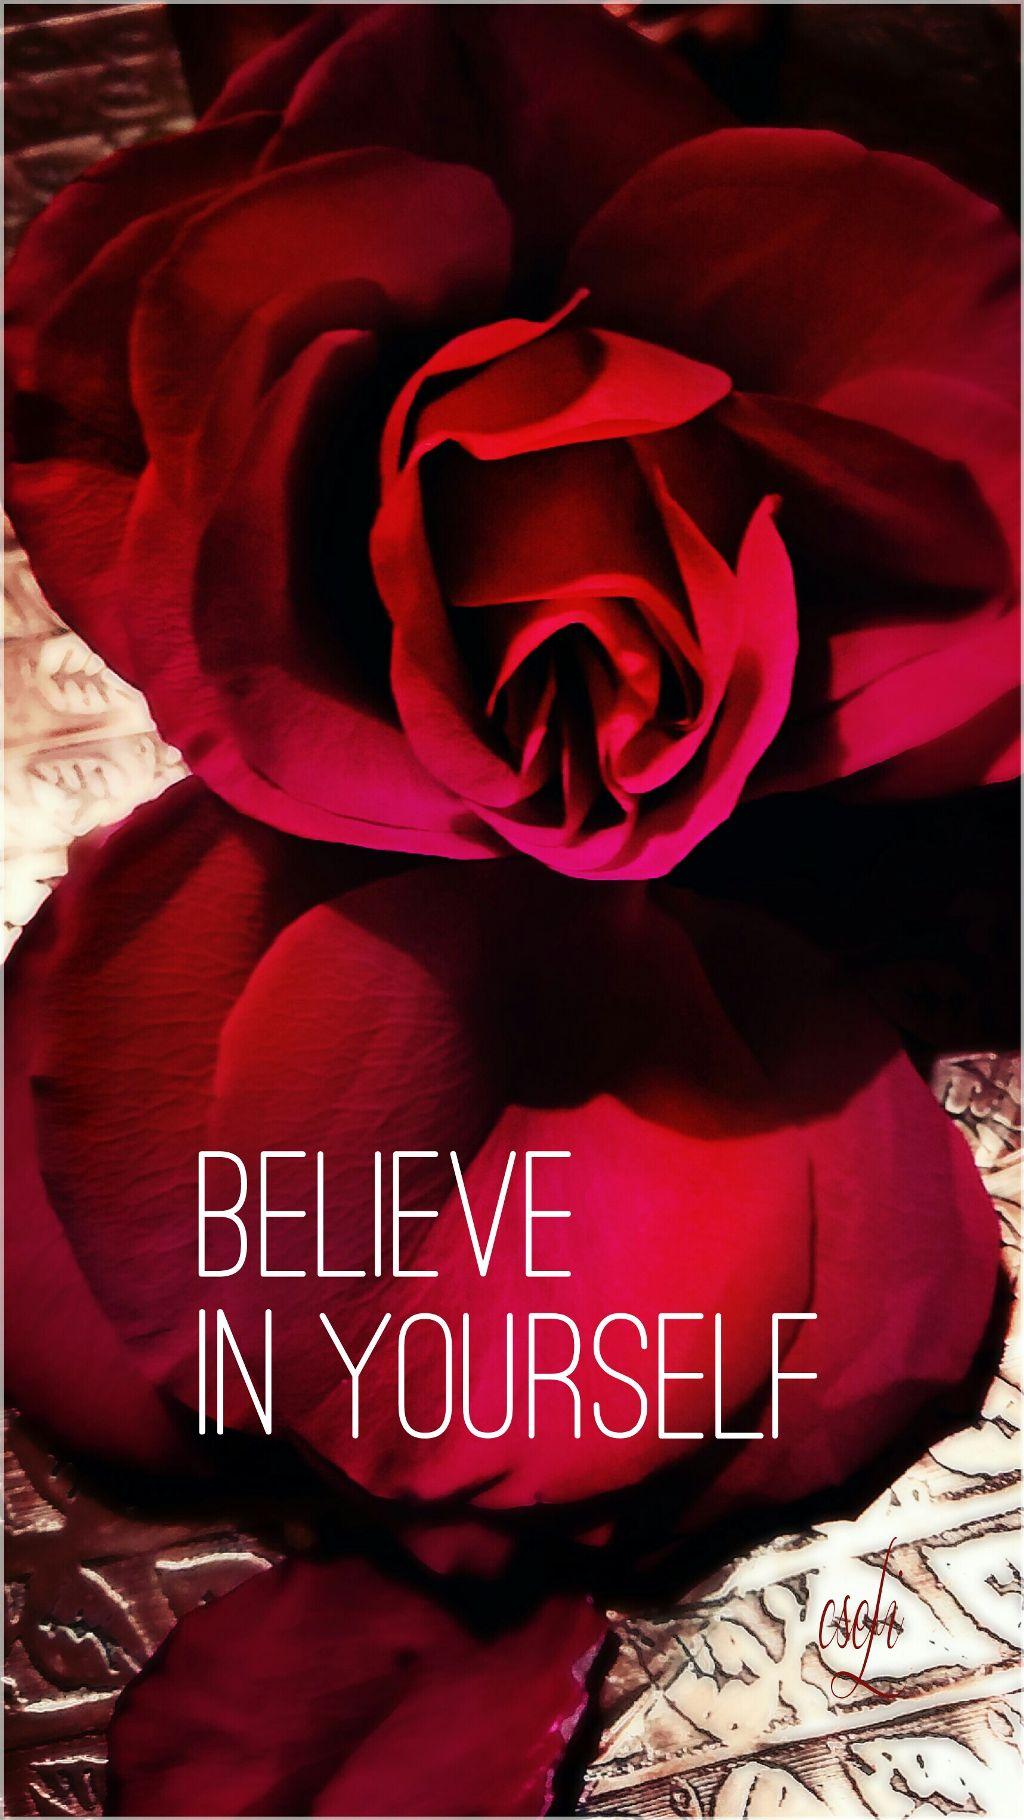 Csefi Rose Quotes Sayings Red Flower